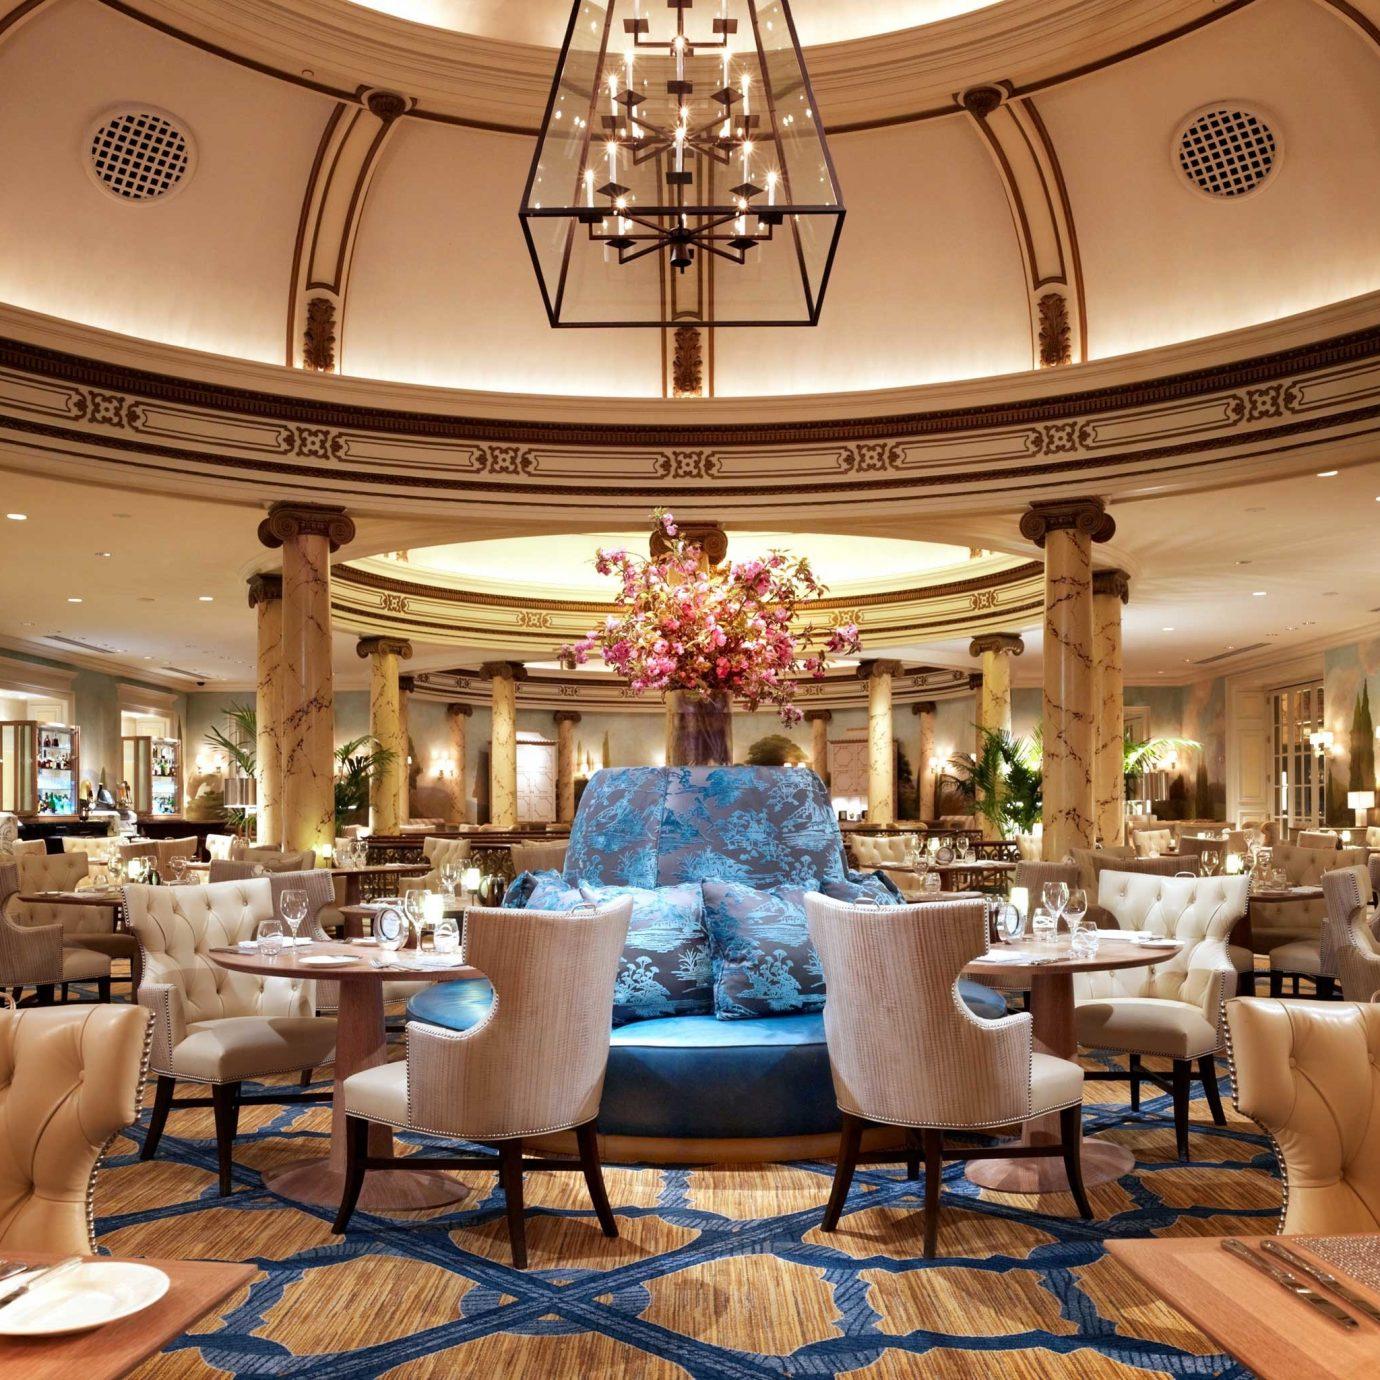 City Dining Drink Eat Luxury Resort Lobby function hall ballroom palace restaurant